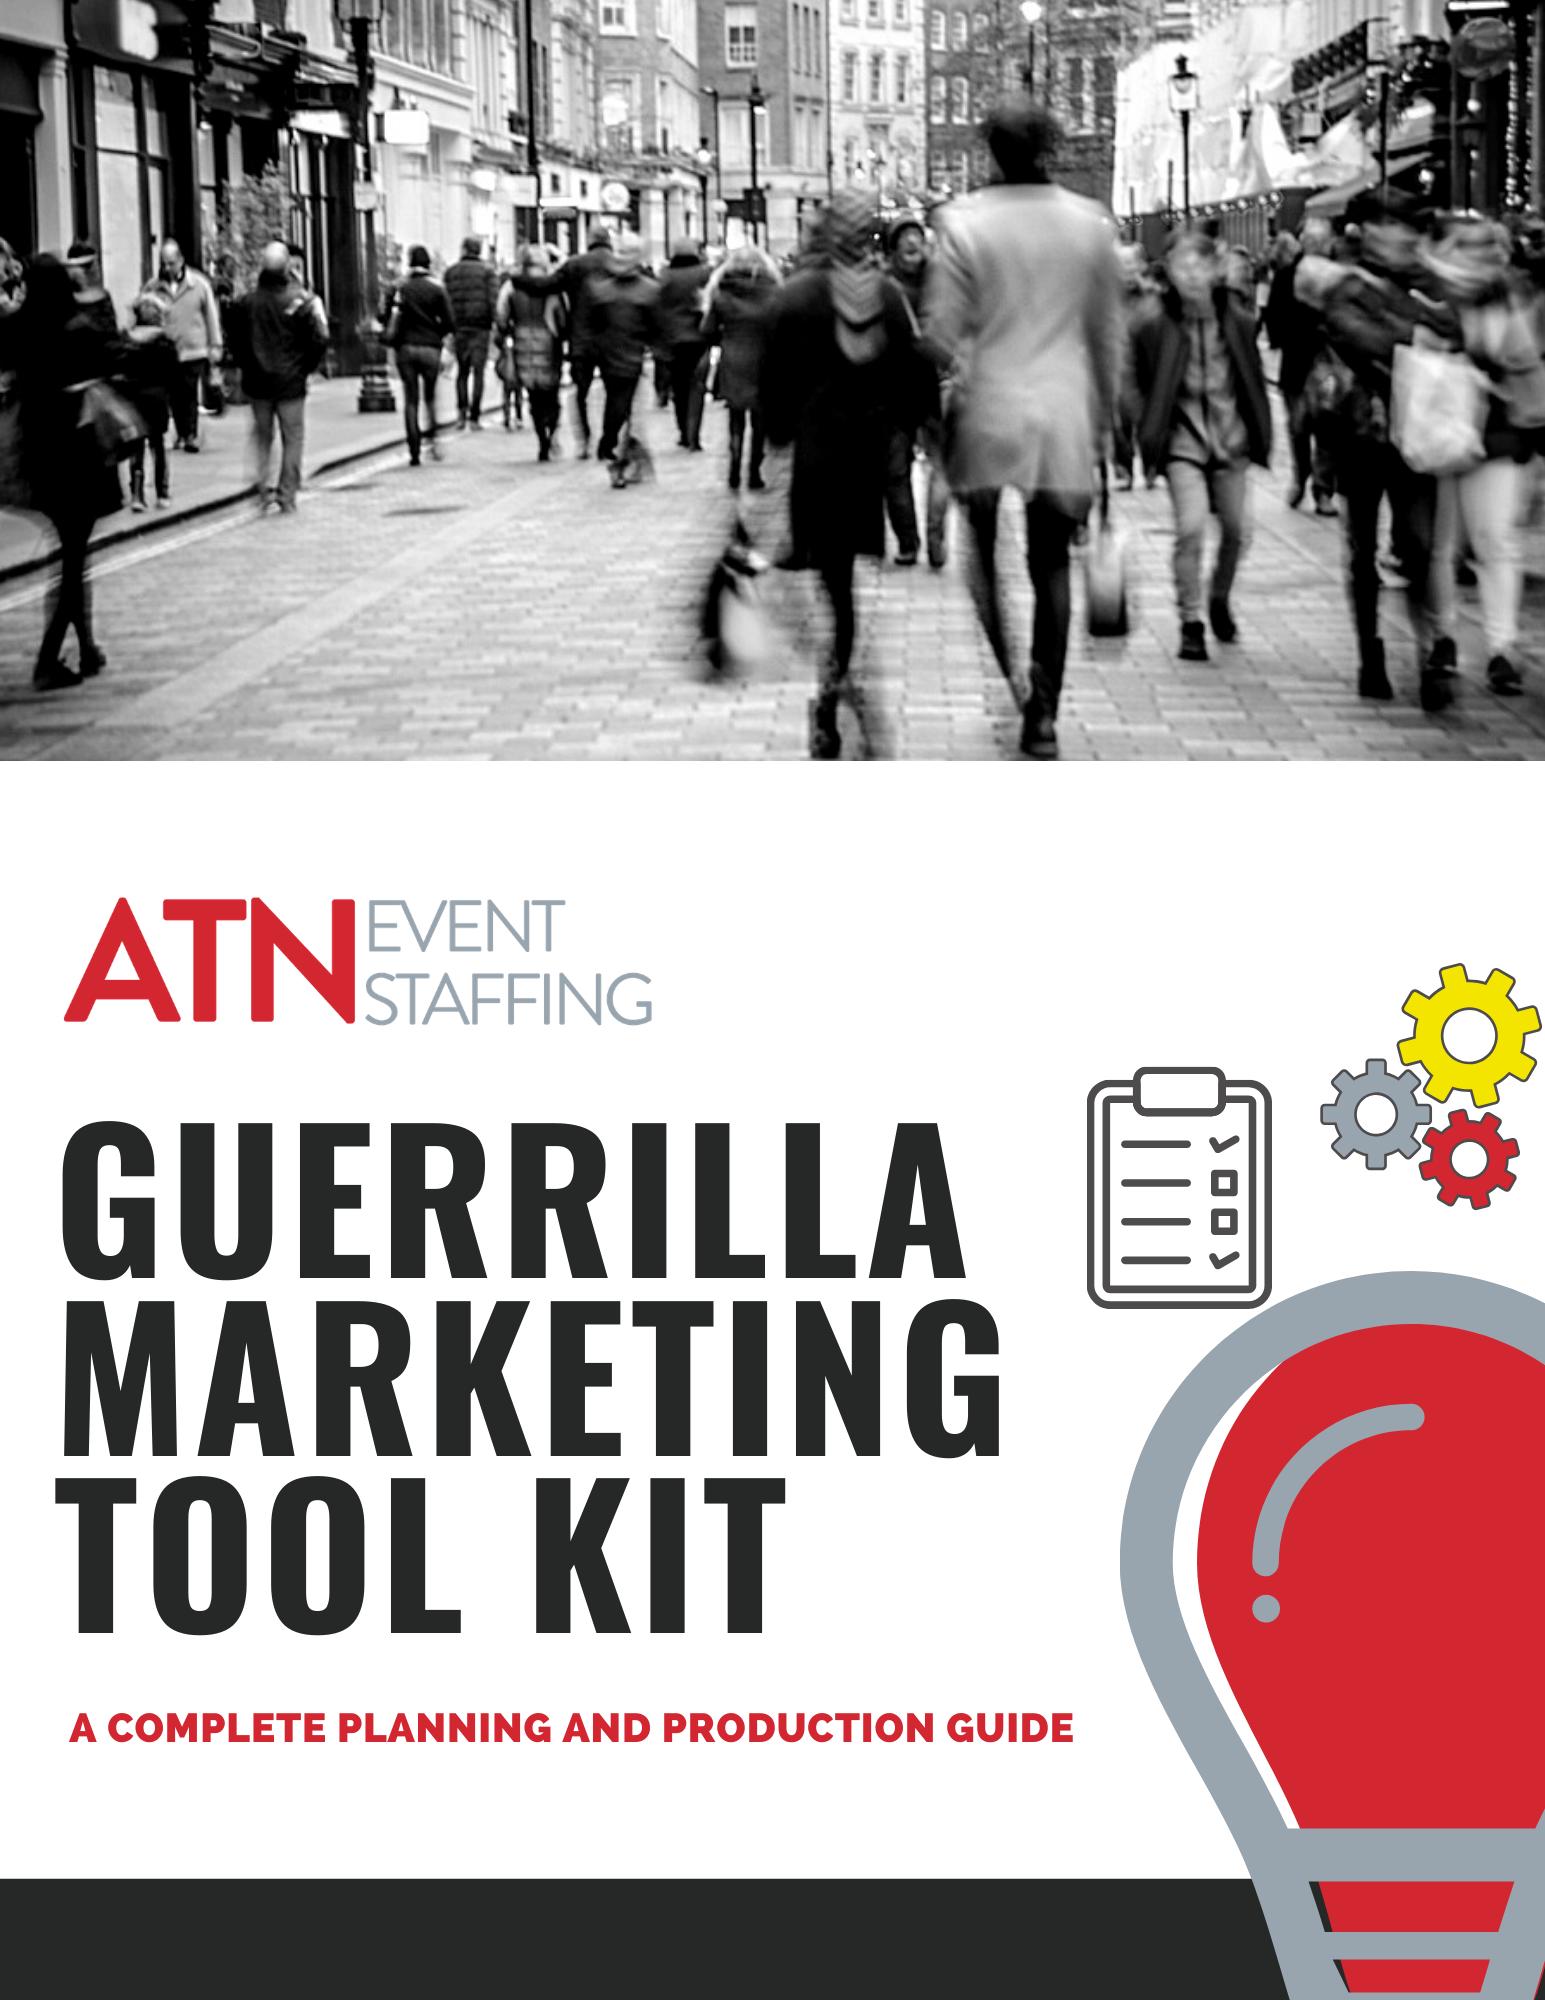 Guerrilla Marketing Tool Kit